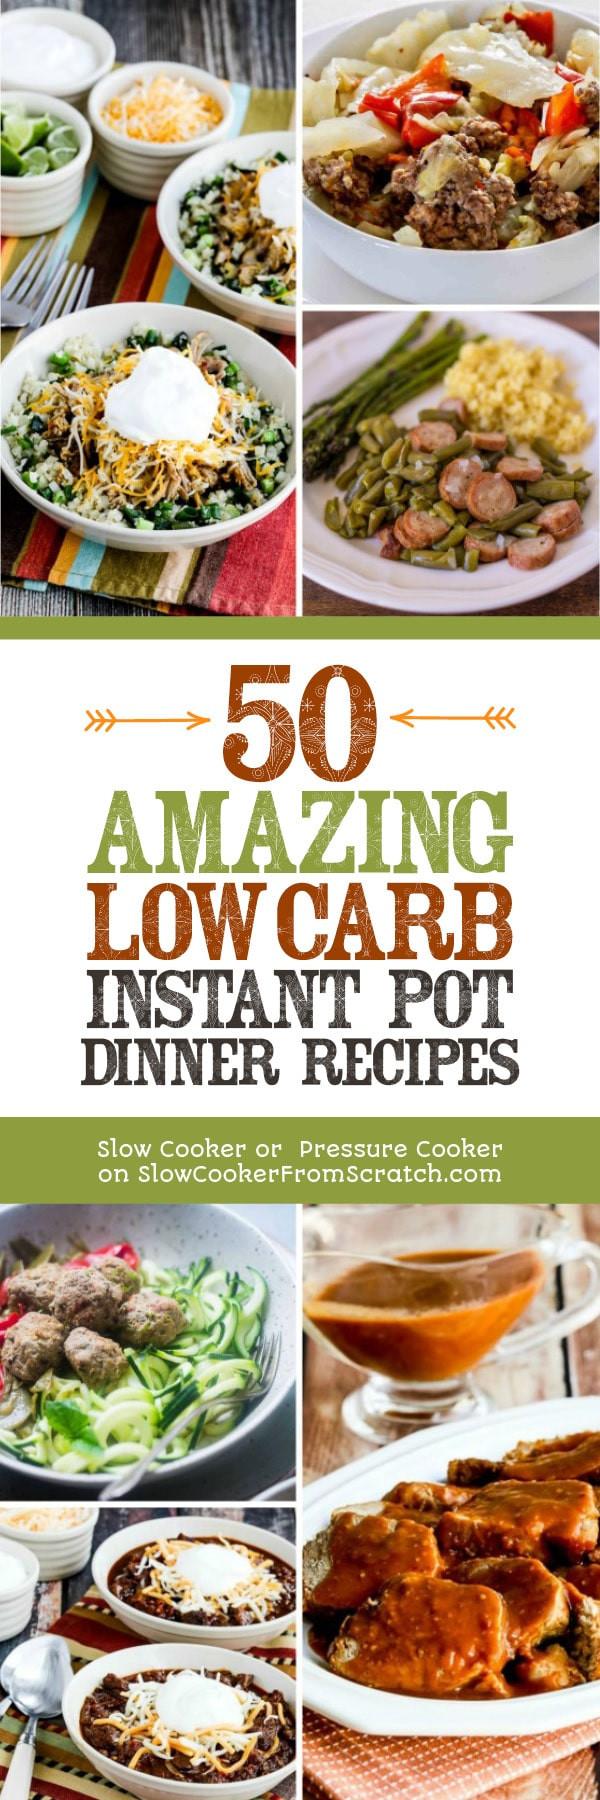 Instant Pot Low Carb Recipes  50 AMAZING Low Carb Instant Pot Dinner Recipes Slow